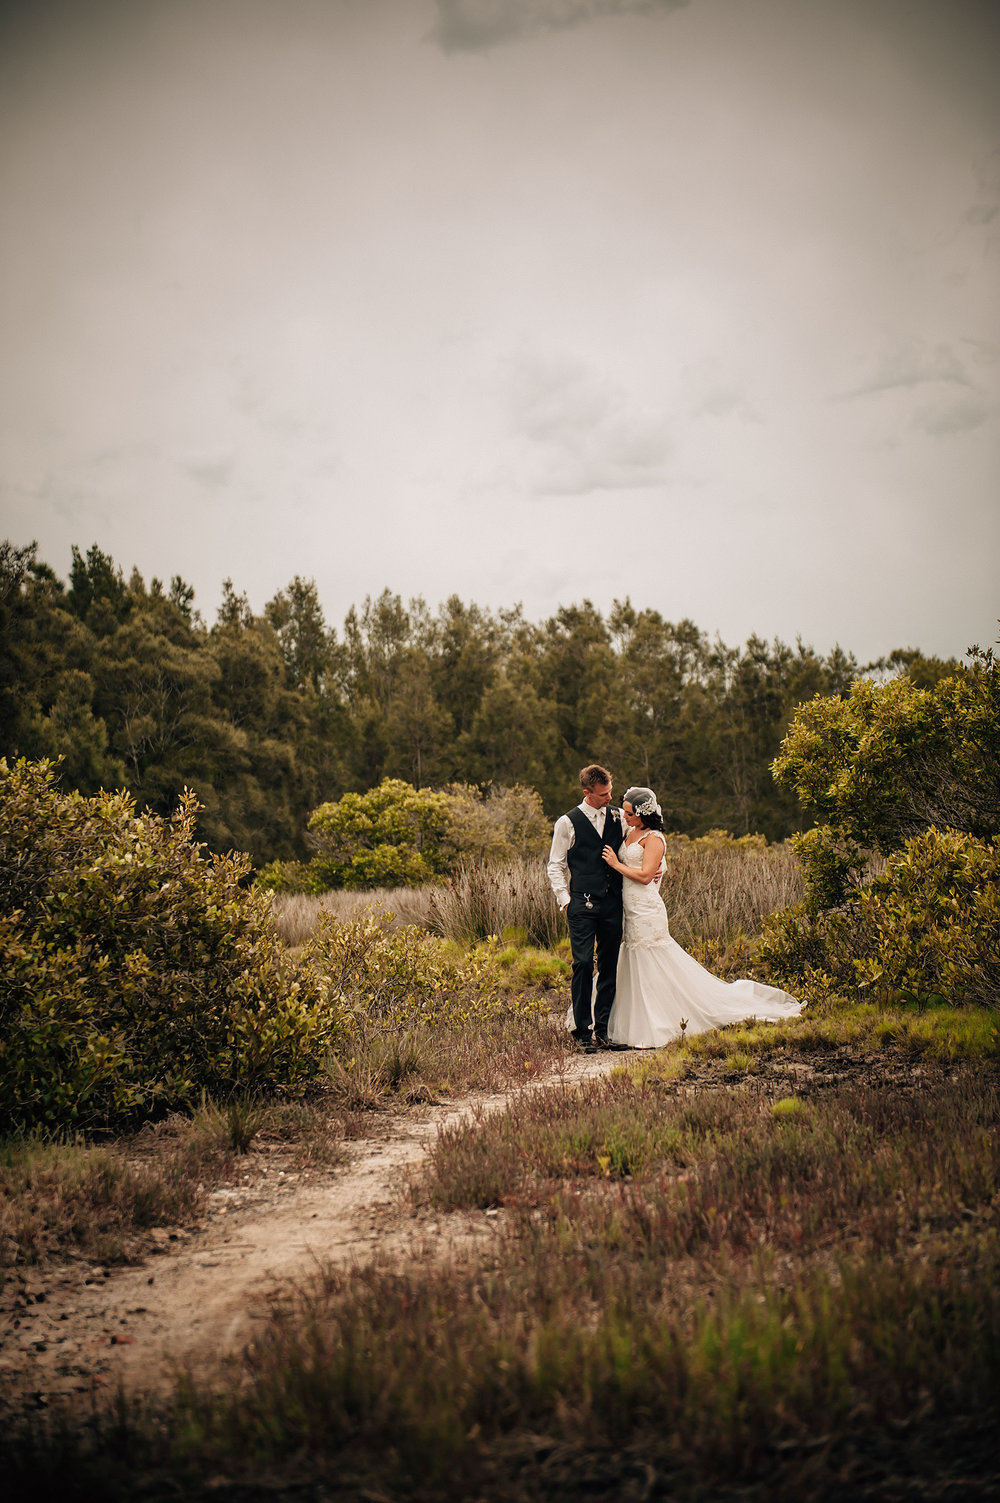 Marryme_wedding_photography_dorrigo_bellingen_photographer_17.jpg